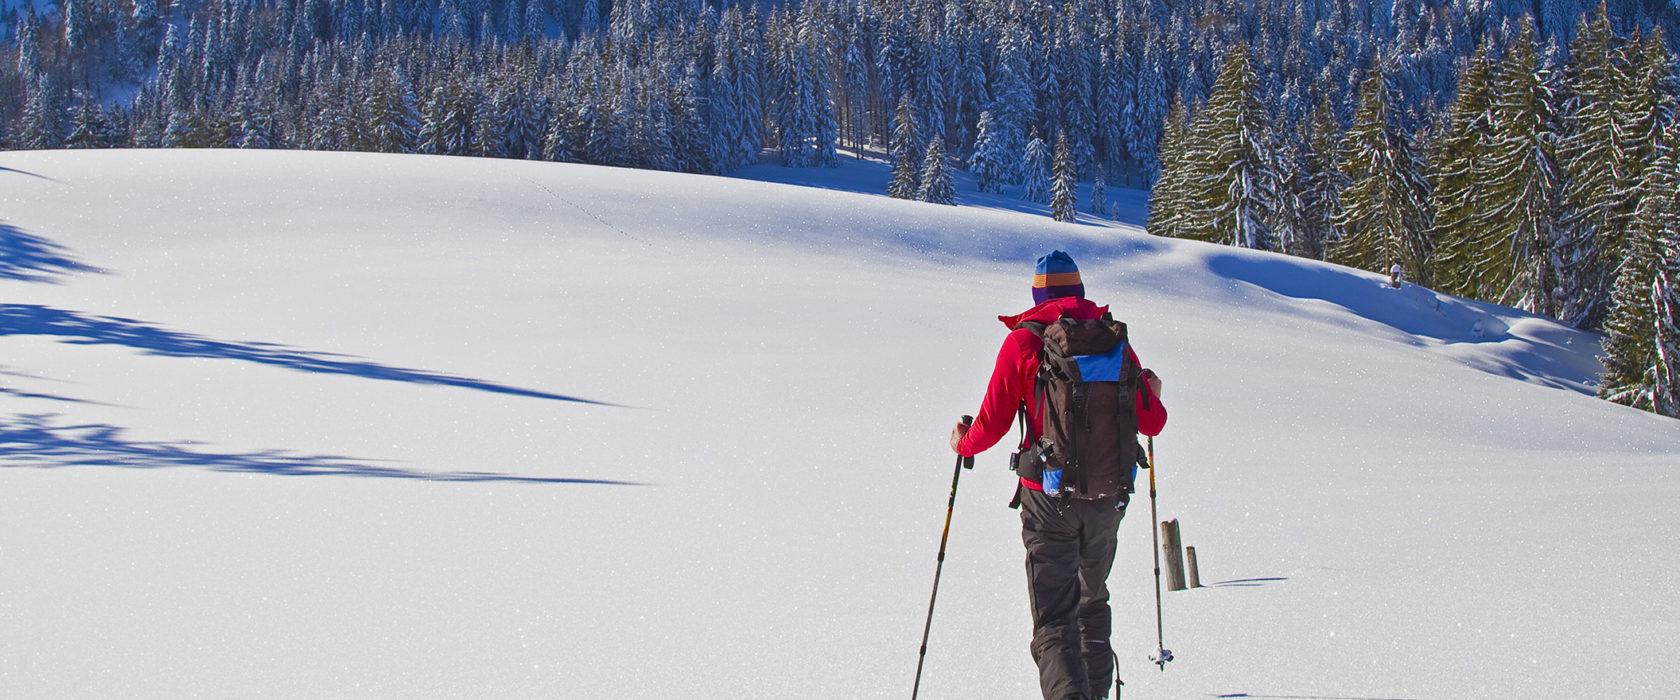 skitouren alpe hohenegg